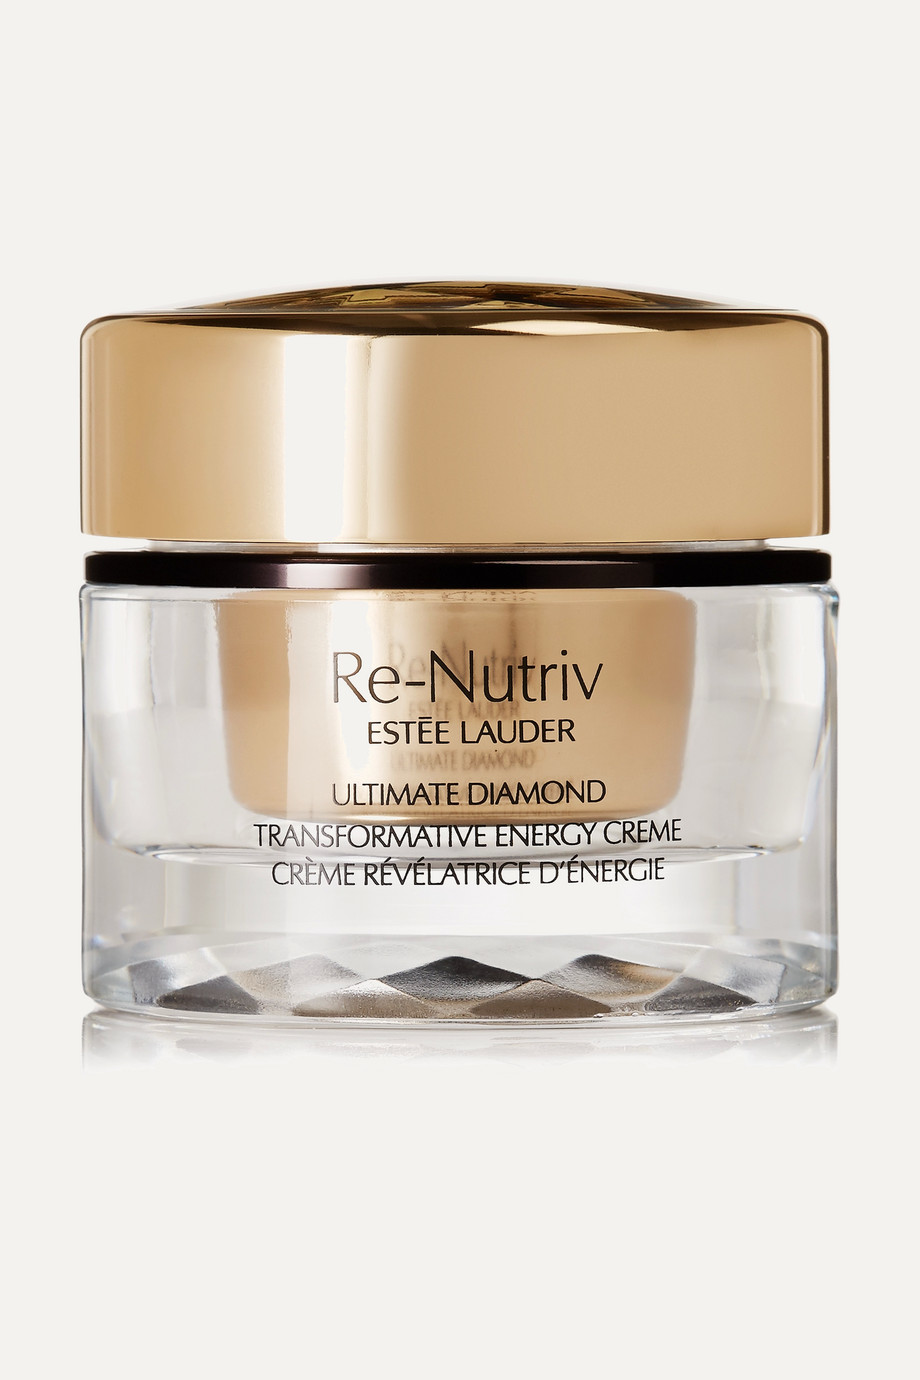 Estée Lauder Re-Nutriv Ultimate Diamond Transformative Energy Creme, 50 ml – Gesichtscreme